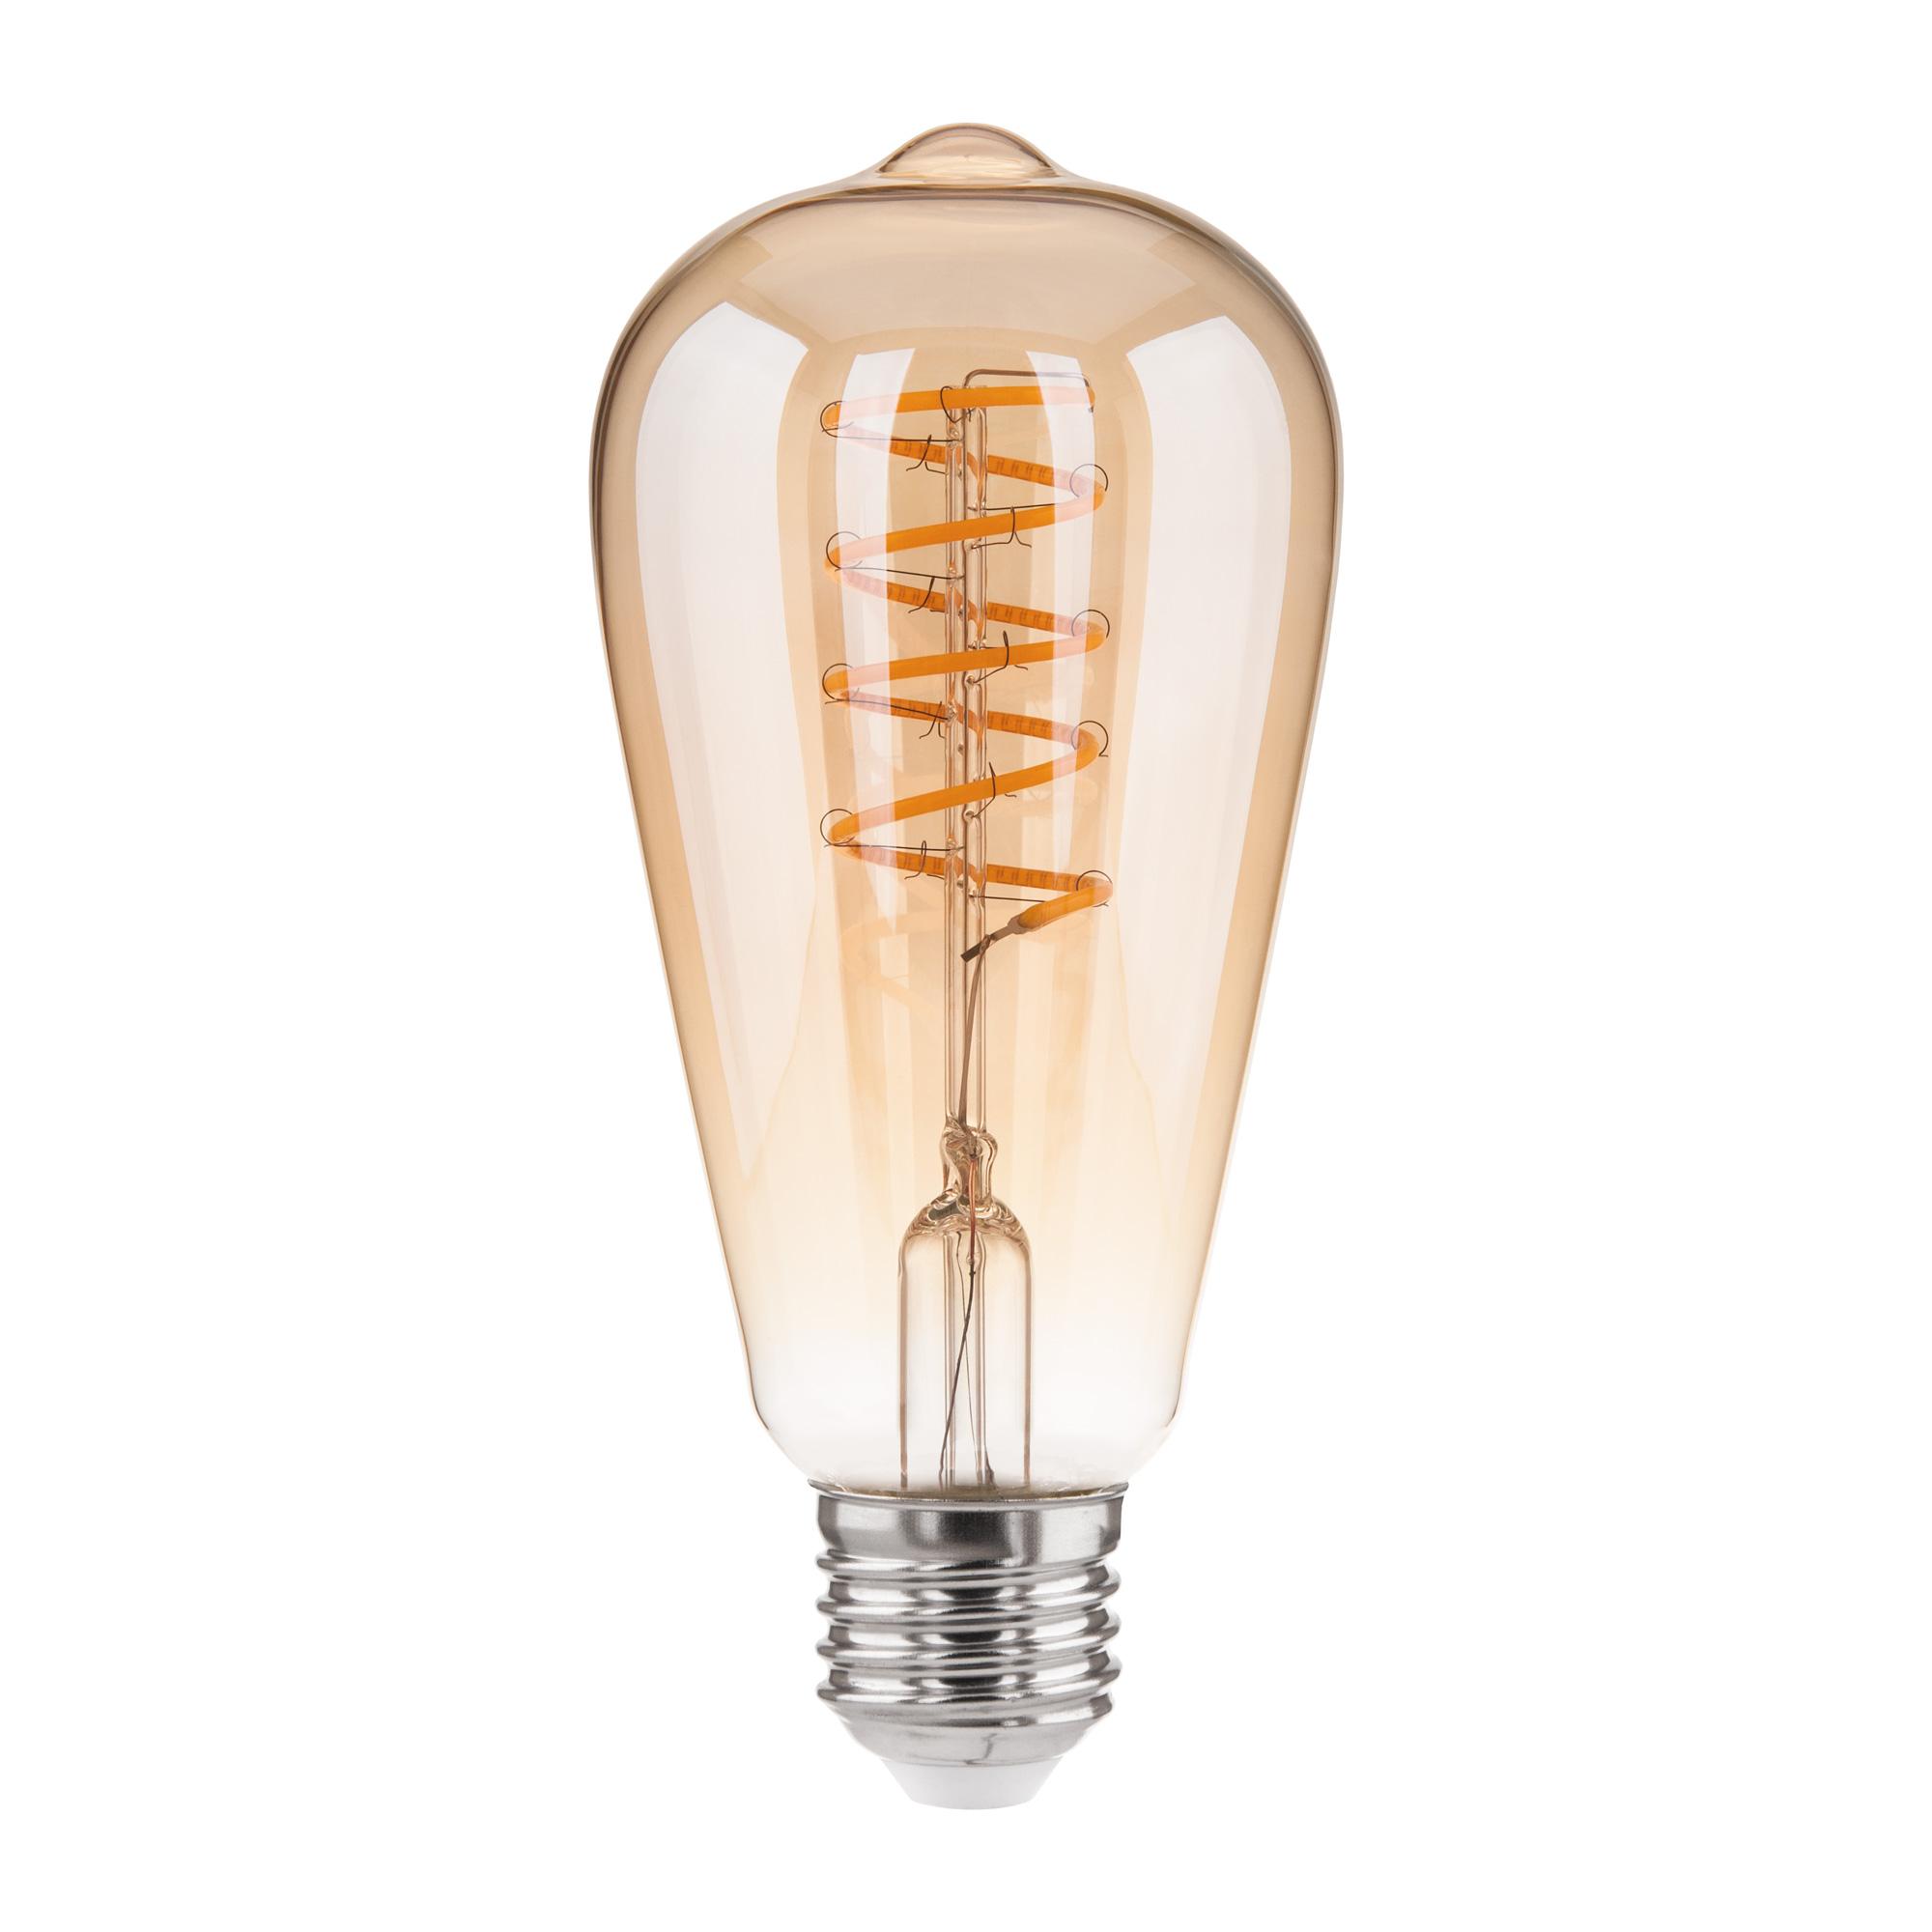 Филаментная светодиодная лампа Dimmable 5W 2700K E27 (ST64 тонированный) BLE2746